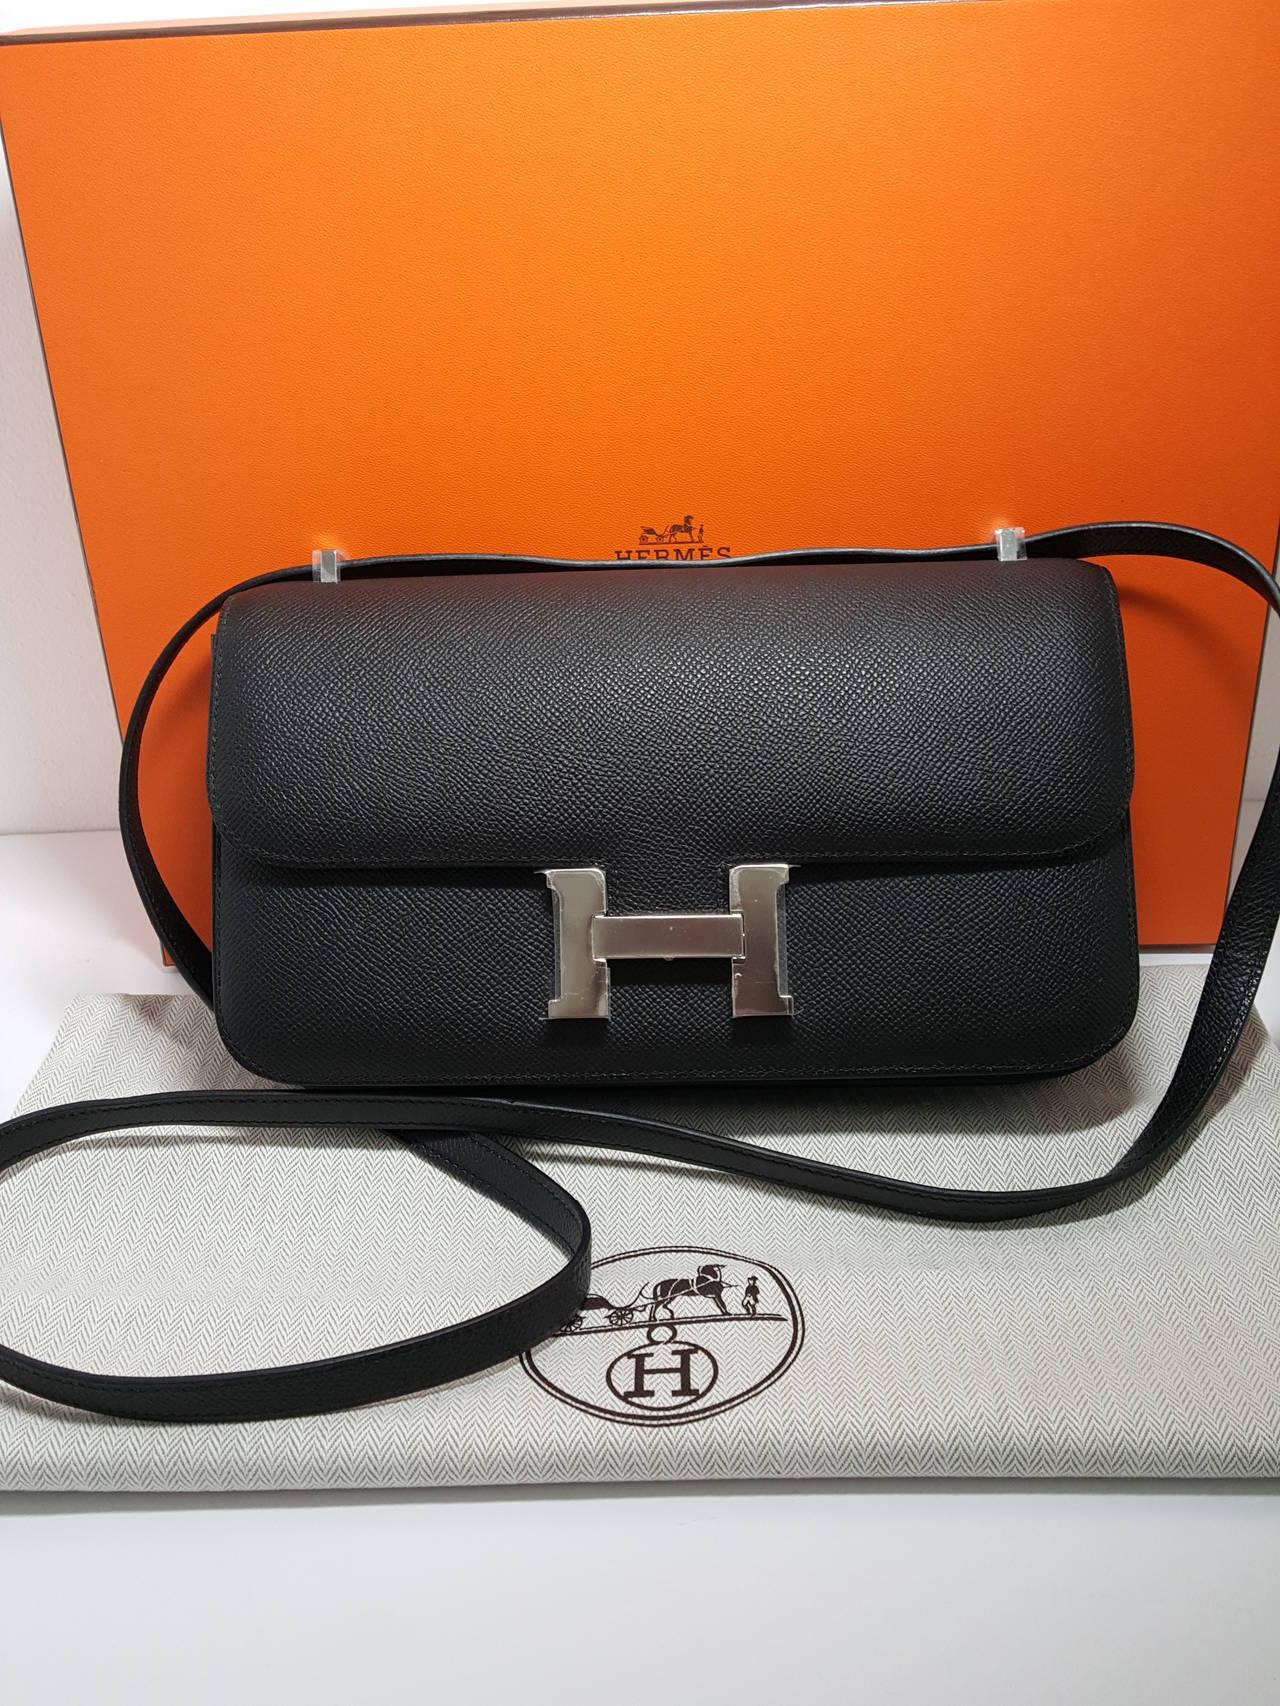 hermes travel wallet - hermes epsom constance elan bag, birkin vs kelly bag